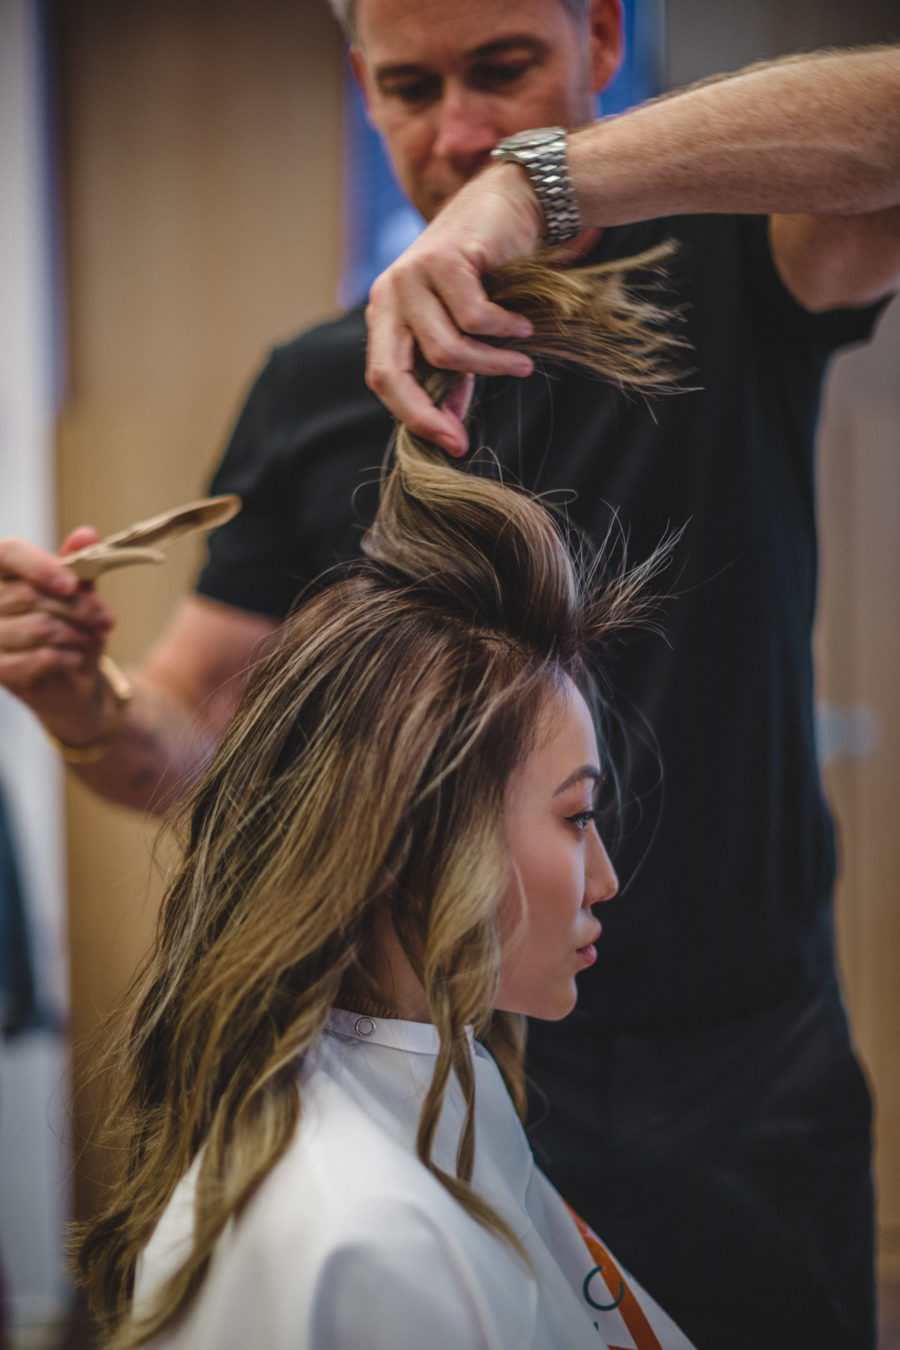 How to Achieve Long Lasting Hair Color - Moroccanoil Color Complete Collection Review, Foilyage hair, Asian Foilyage, Blonde Foilyage // Notjessfashion.com